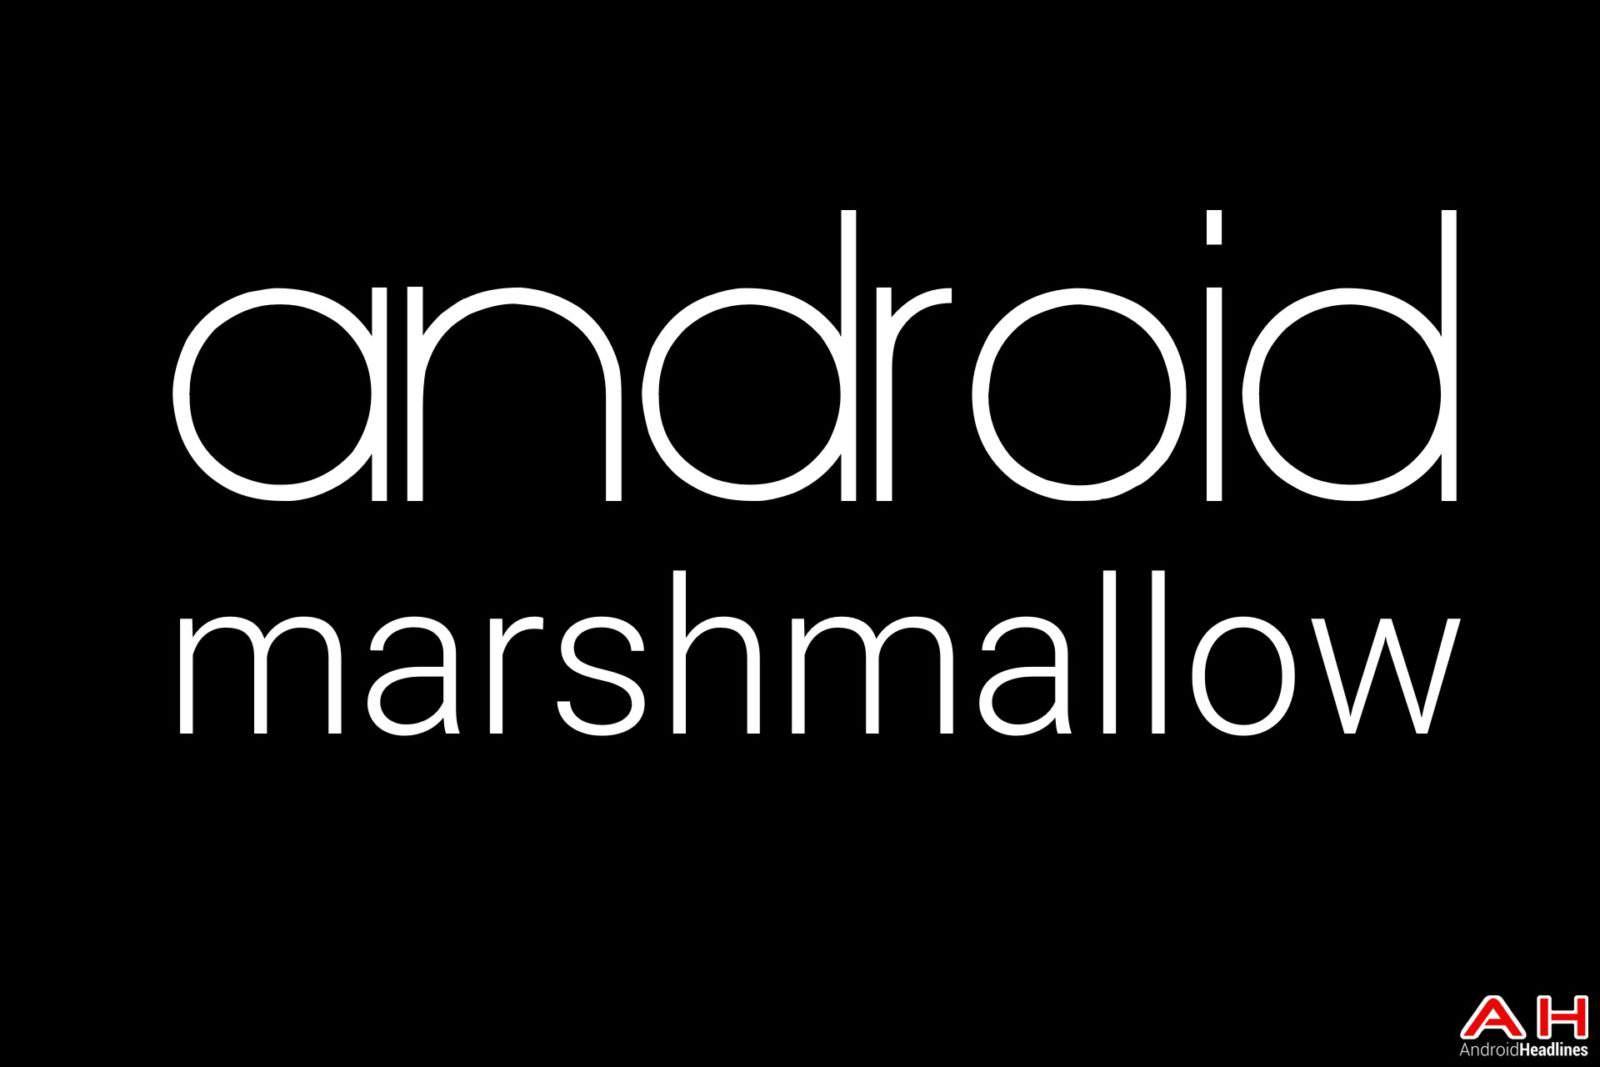 AH Android Marshmallow Logo 1.1